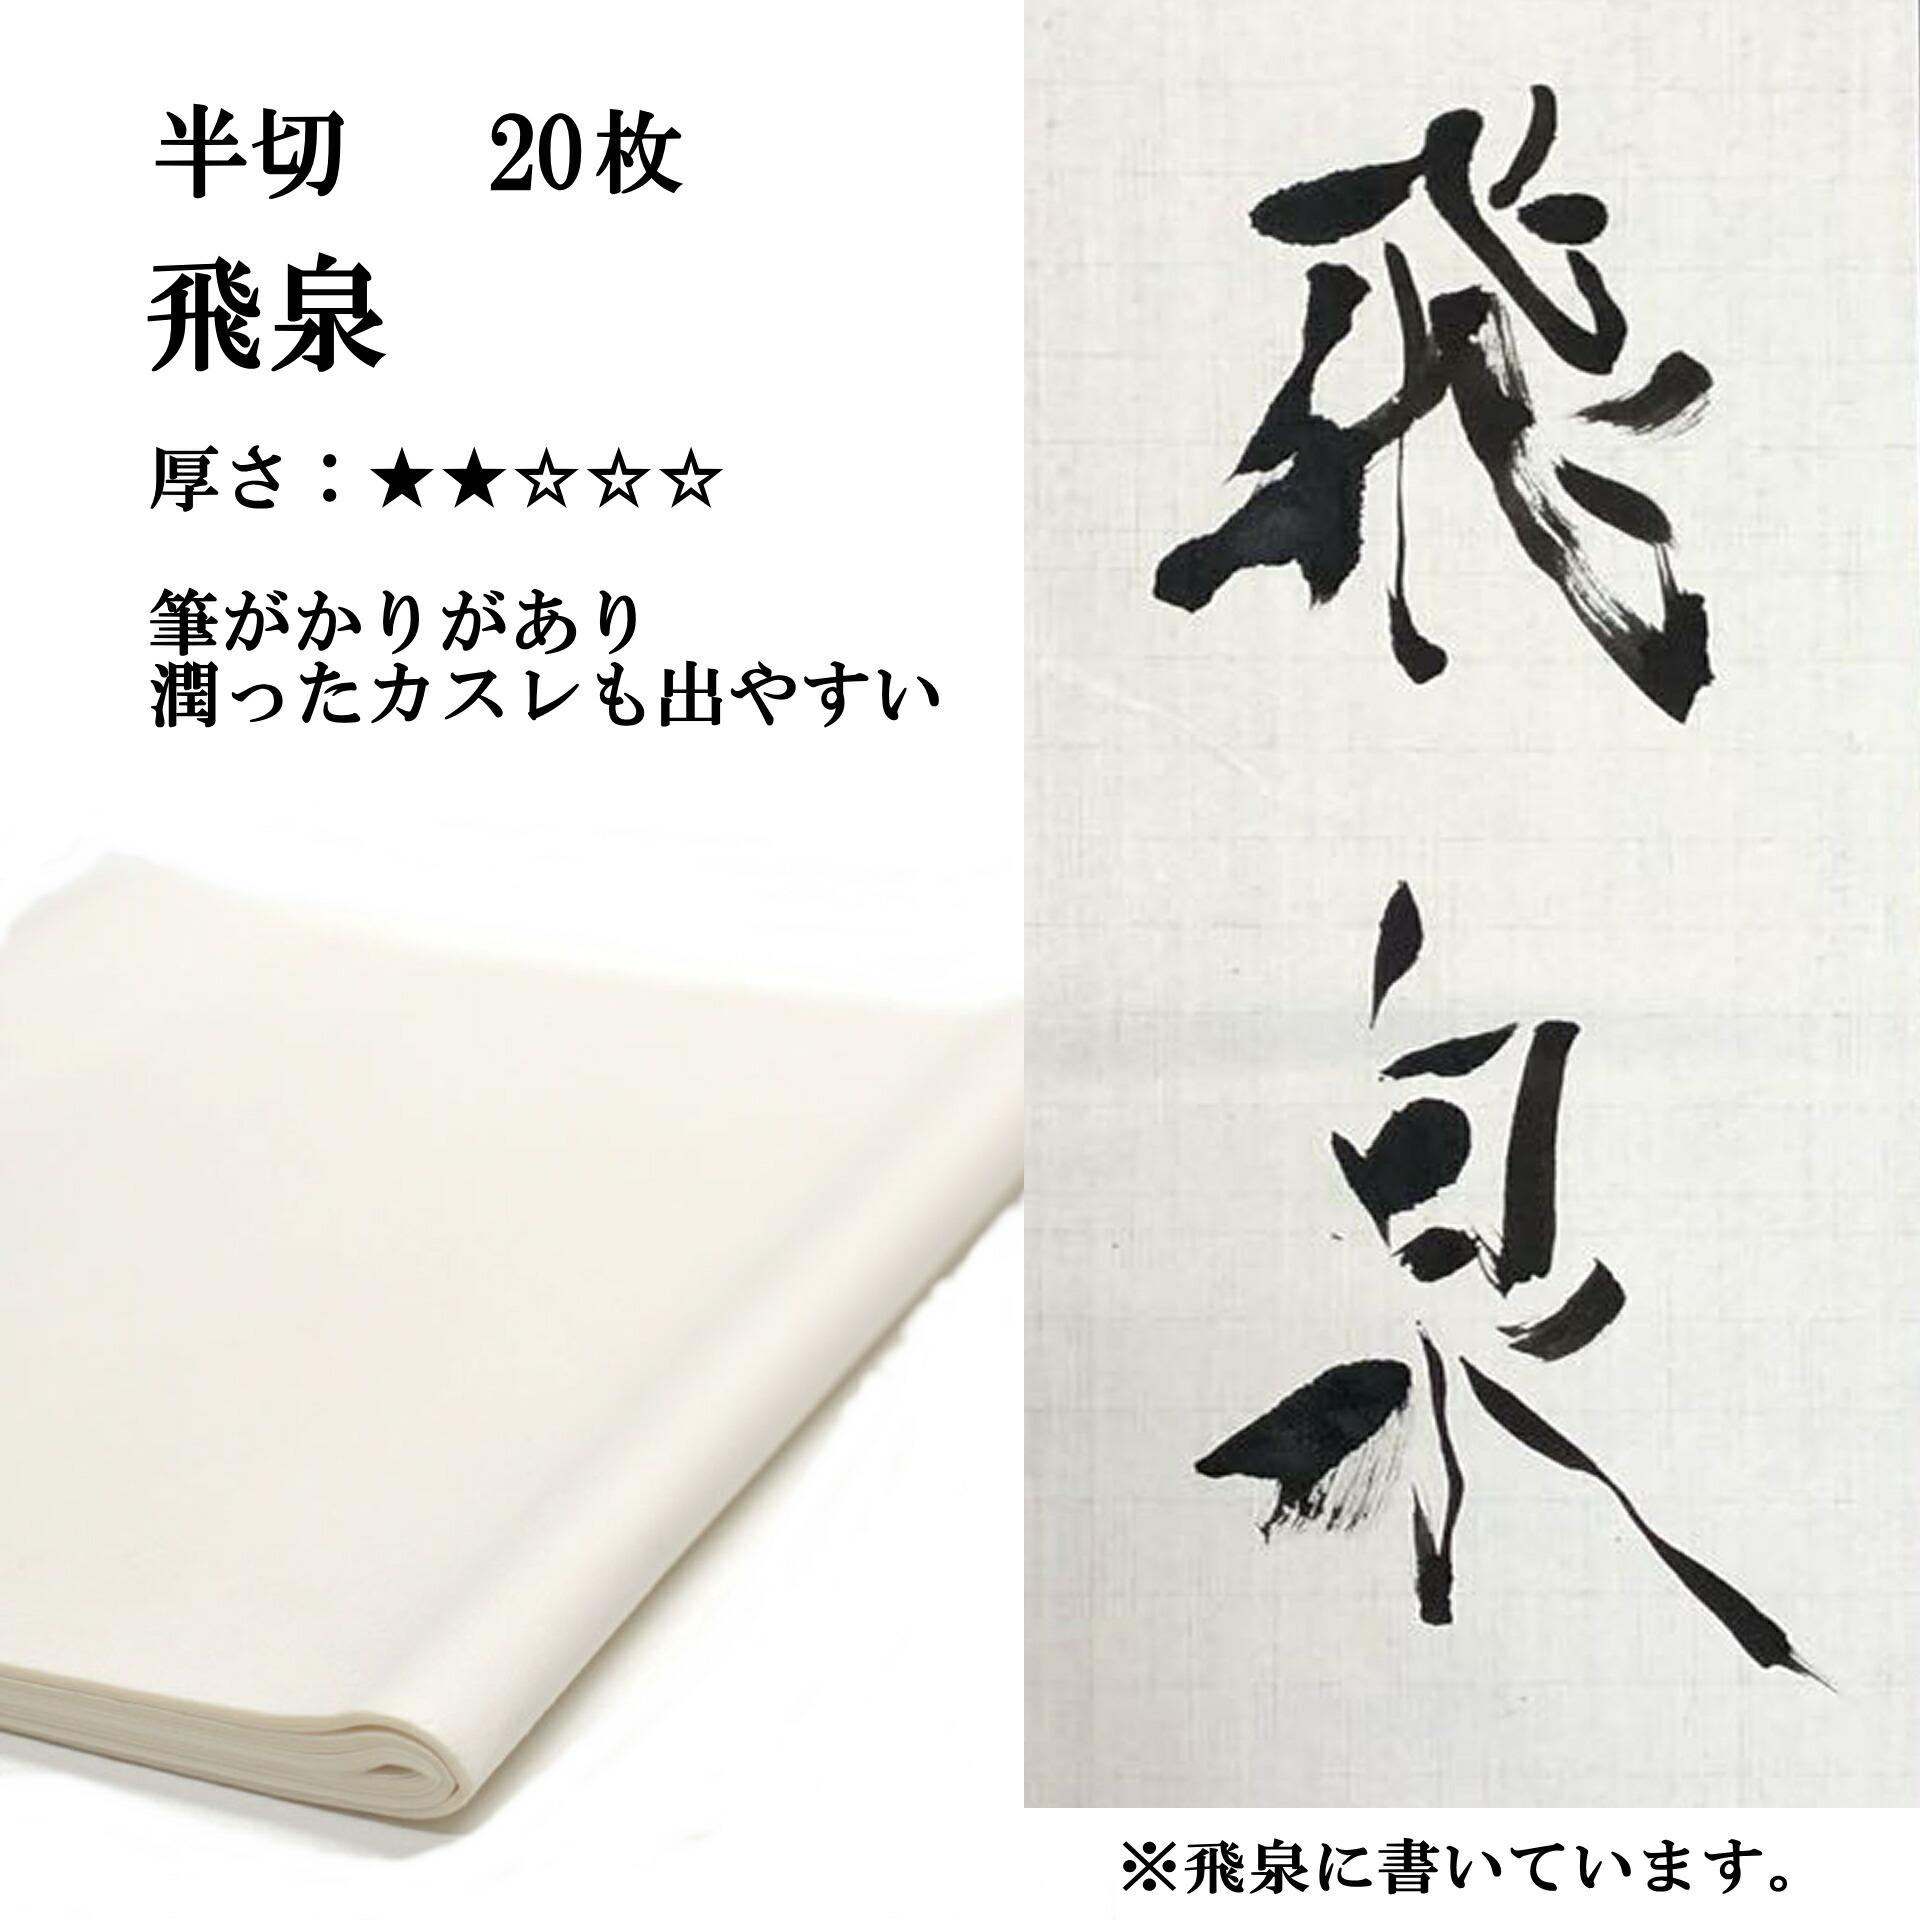 手漉き画仙紙 飛泉 20枚